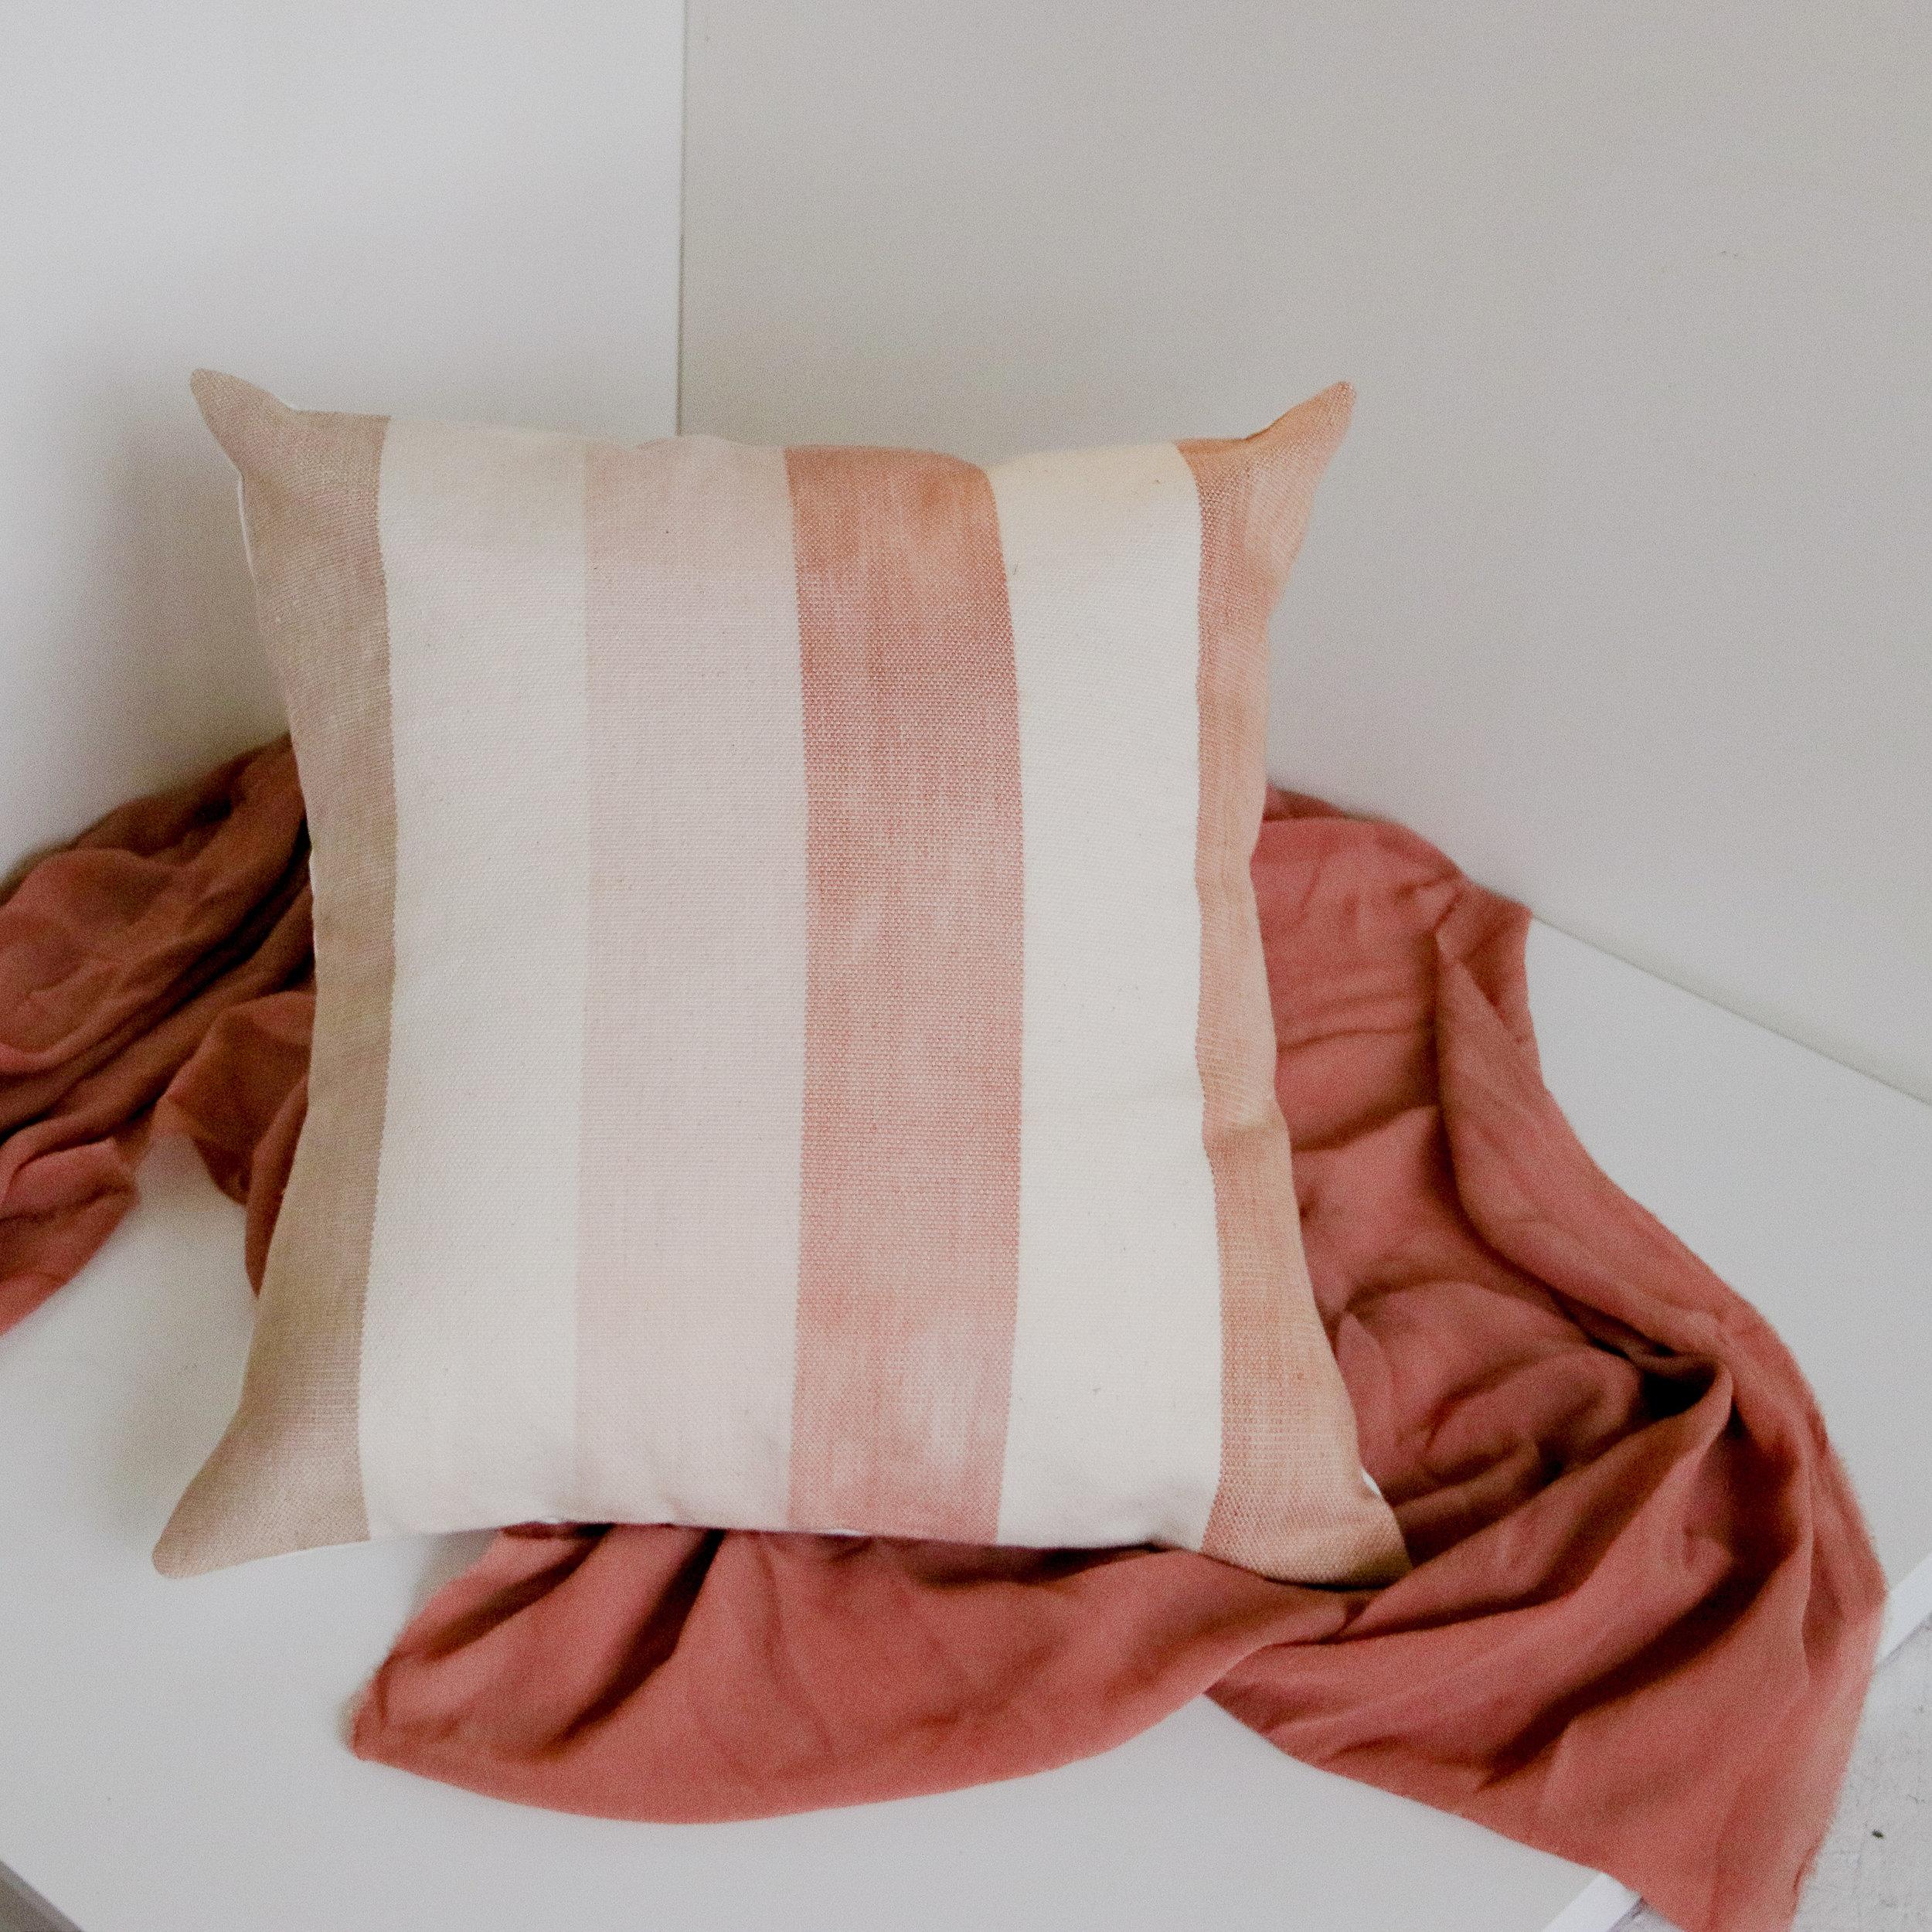 Fawn Woven Pillow -Salt Textile Studios - $95